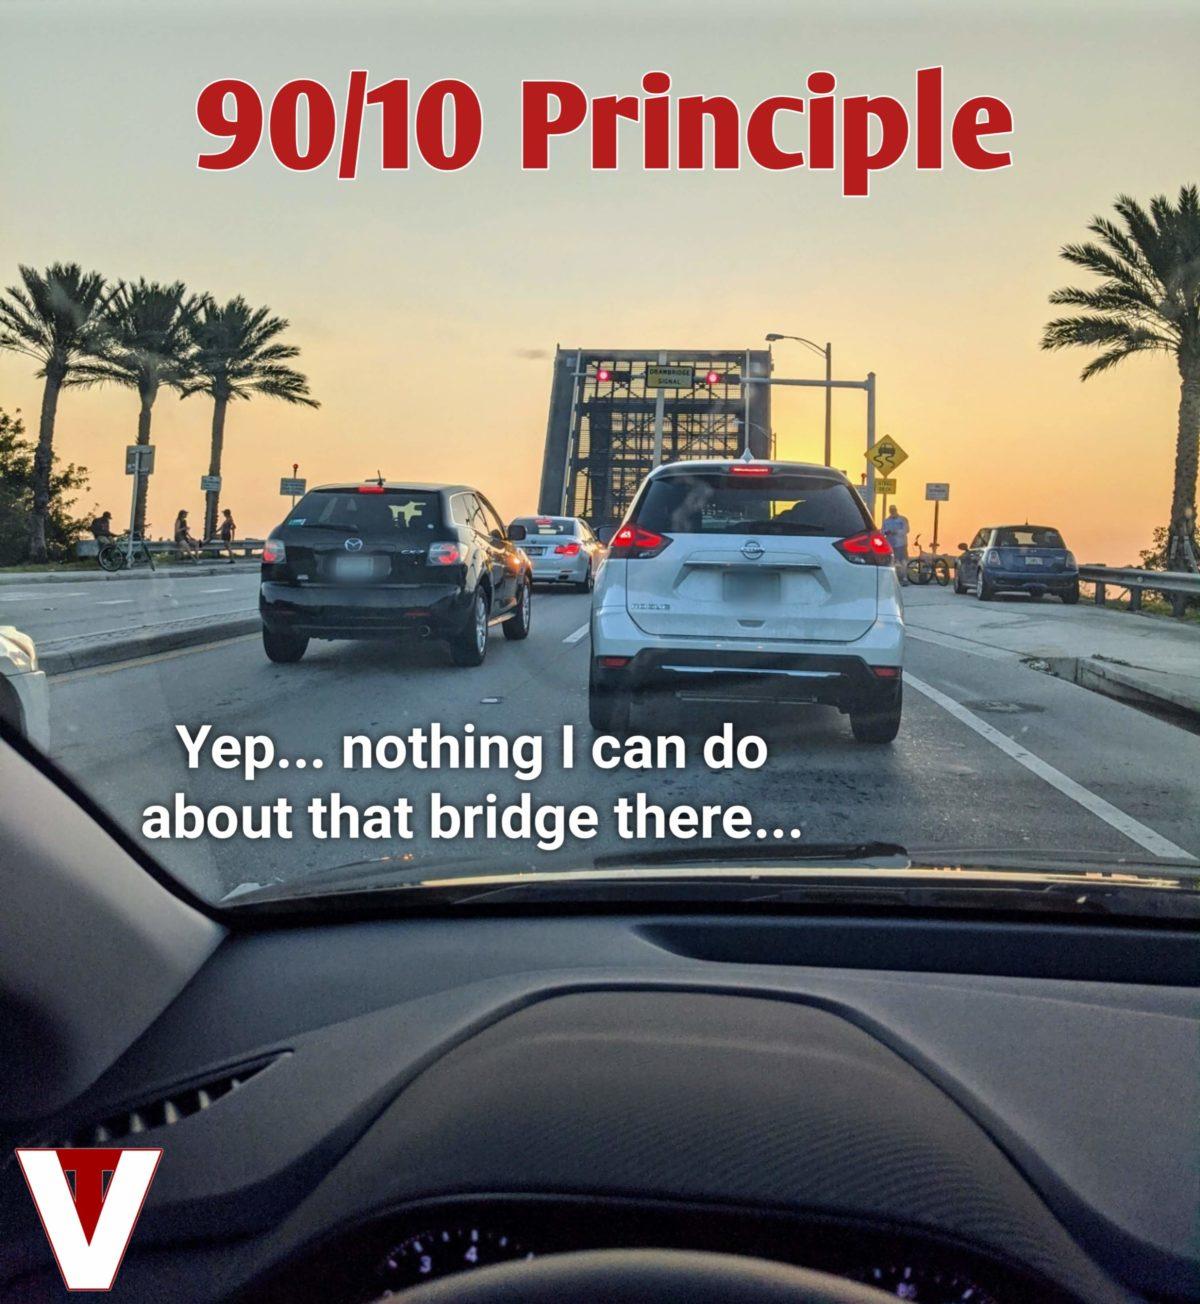 9010 Principle Rule